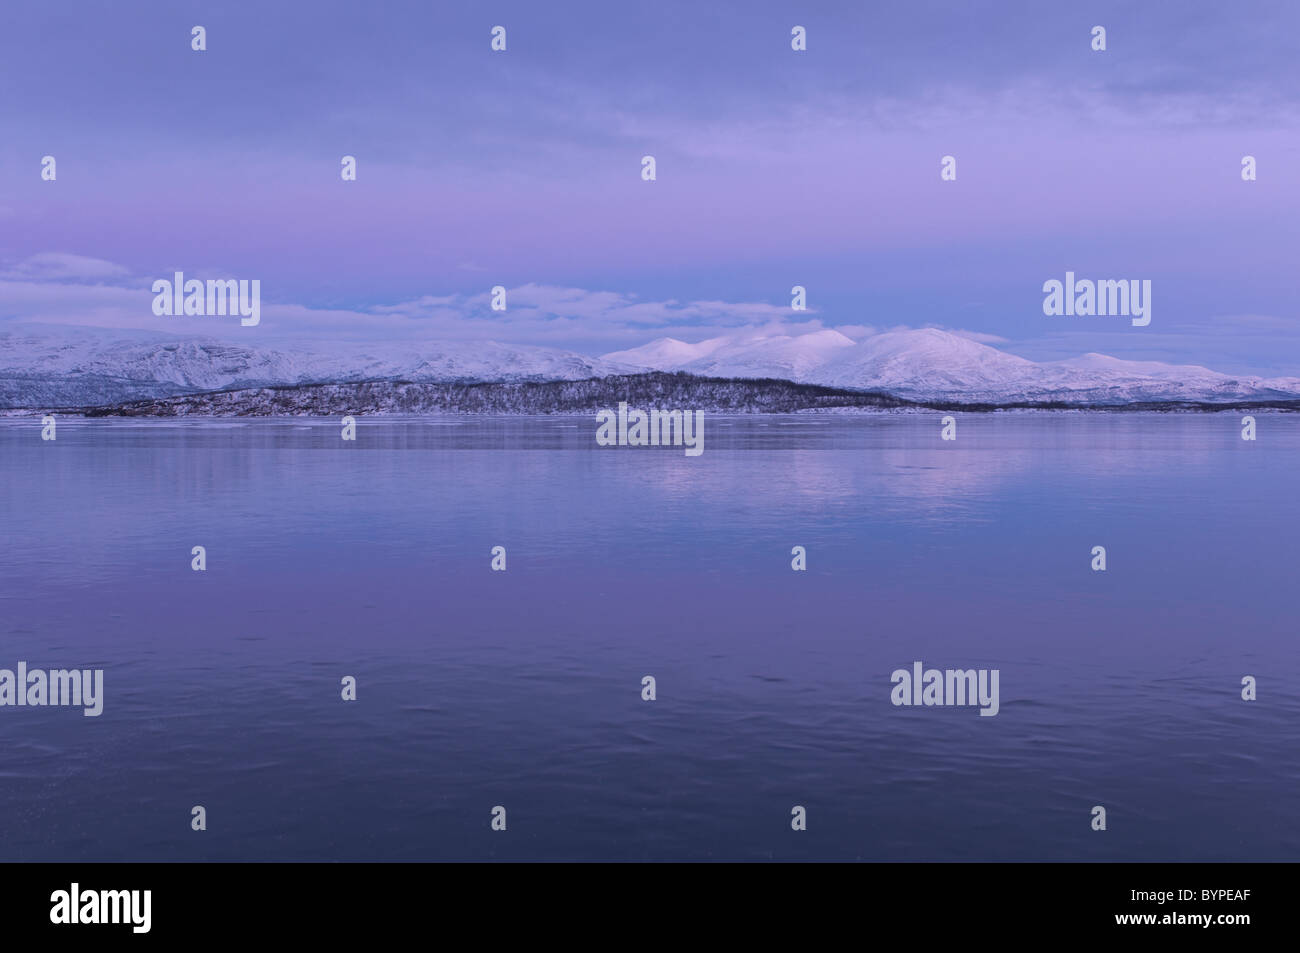 Tornetraesk, Abisko, Lappland, Schweden frozen lake tornetraesk, abisko, lapland, sweden - Stock Image